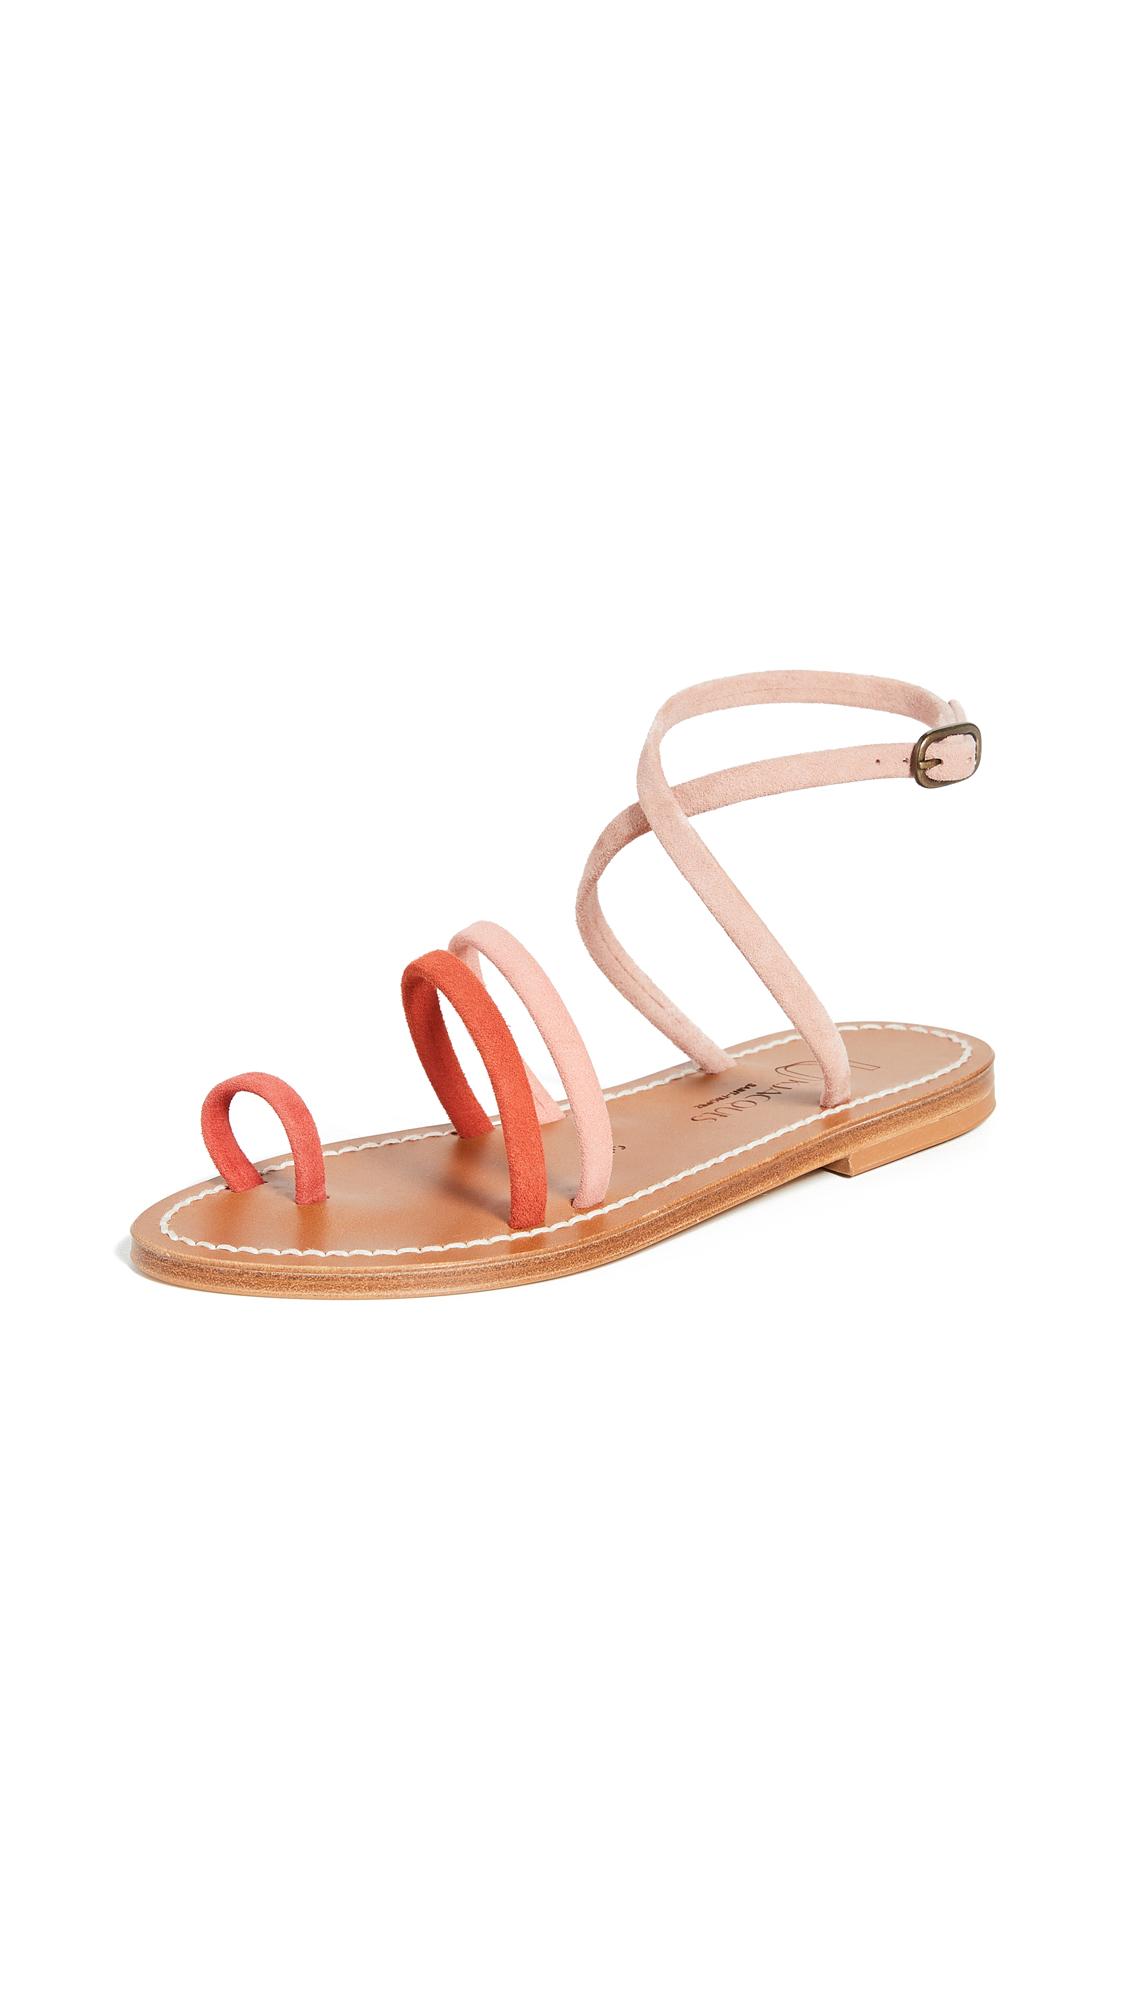 Buy K. Jacques Asgard Toe Ring Sandals online, shop K. Jacques